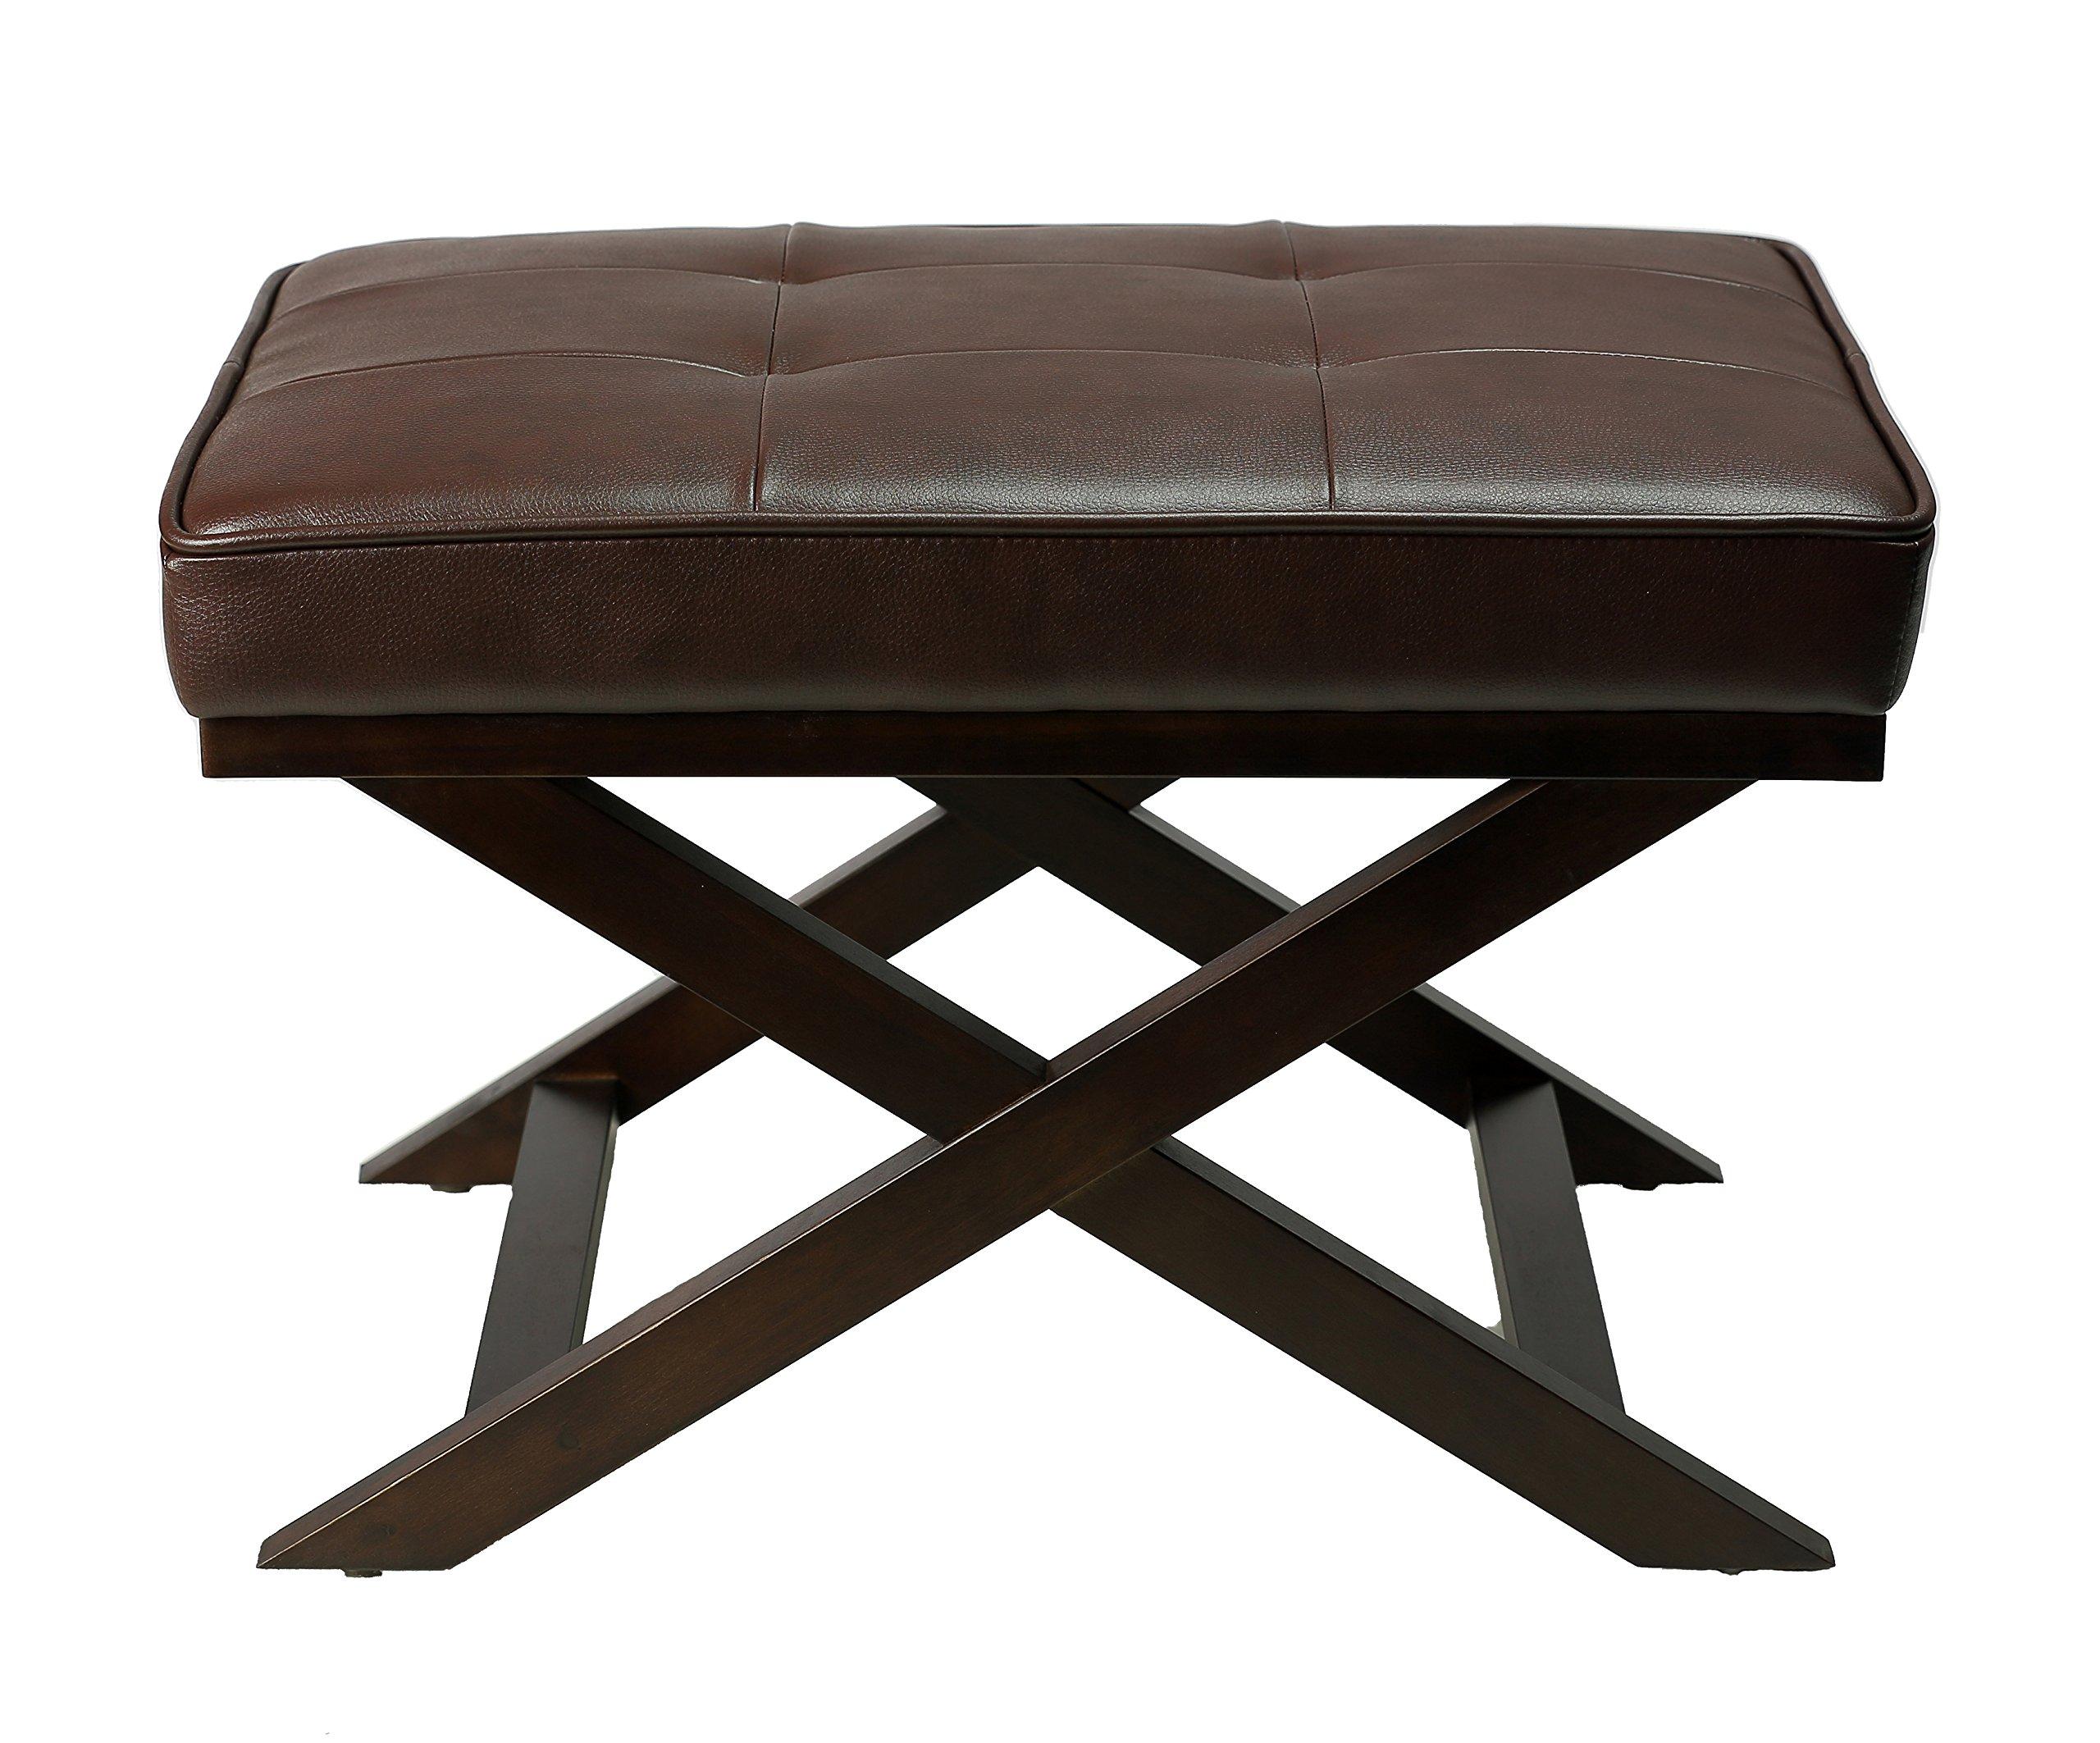 Cortesi Home Ari ''X'' Bench Ottoman in Bonded Leather with Dark Walnut Wood Legs, Brown